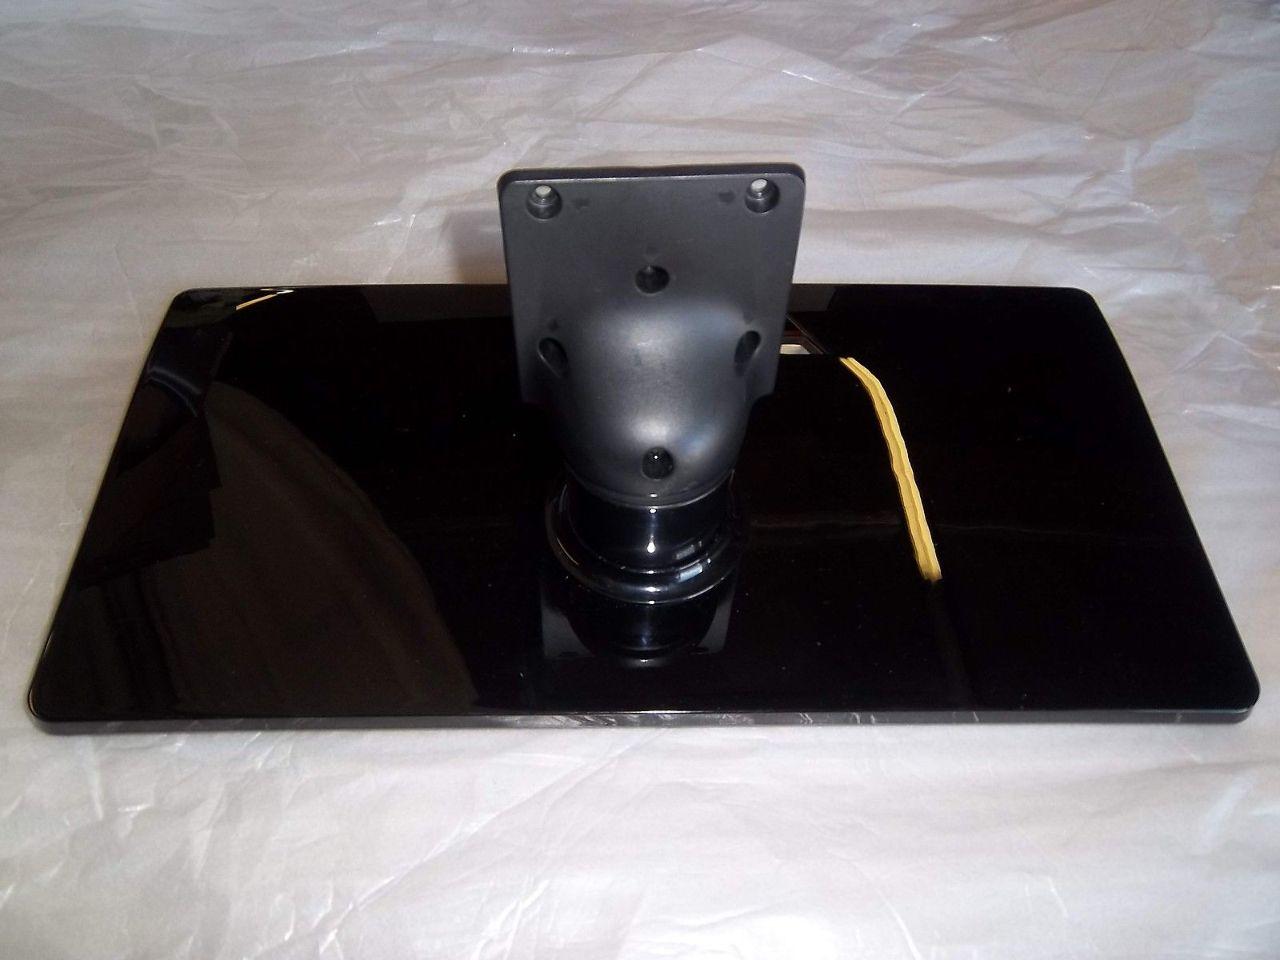 apex 32 le3212d e325bd 1432ak30 lcd tv neck base stand mount screws free s h ebay. Black Bedroom Furniture Sets. Home Design Ideas